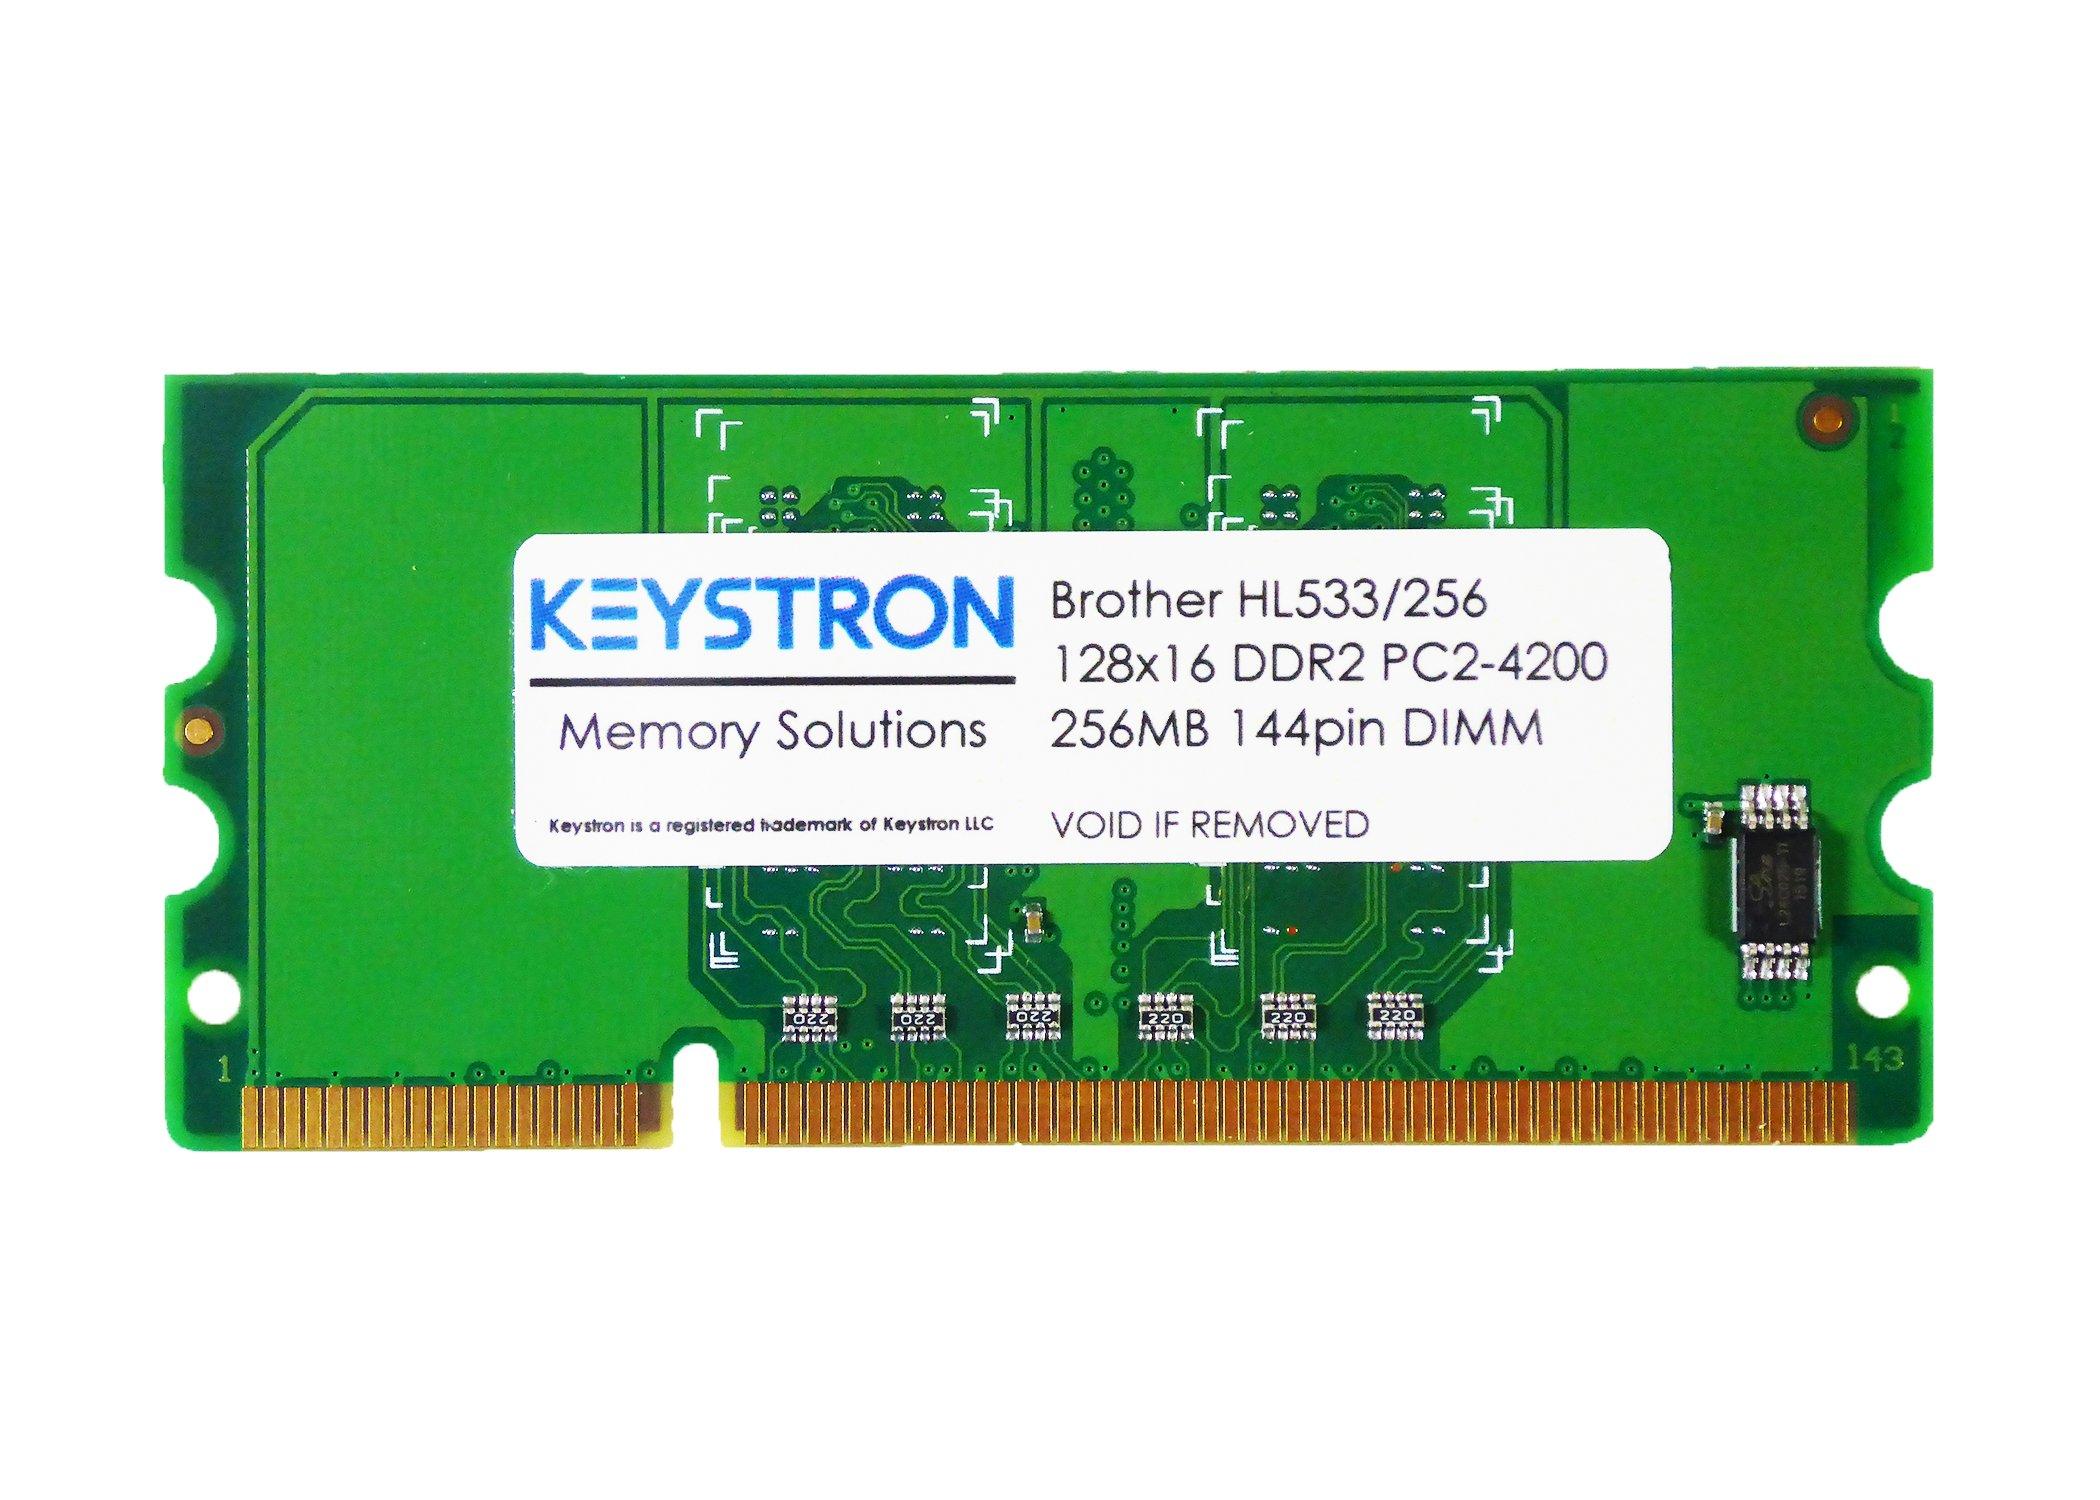 Keystron 256MB DDR2 144pin 16bit Memory Upgrade for Brother Laser Printer MFC-L8600CDW, MFC-L8850CDW, MFC-L9550CDW by Keystron